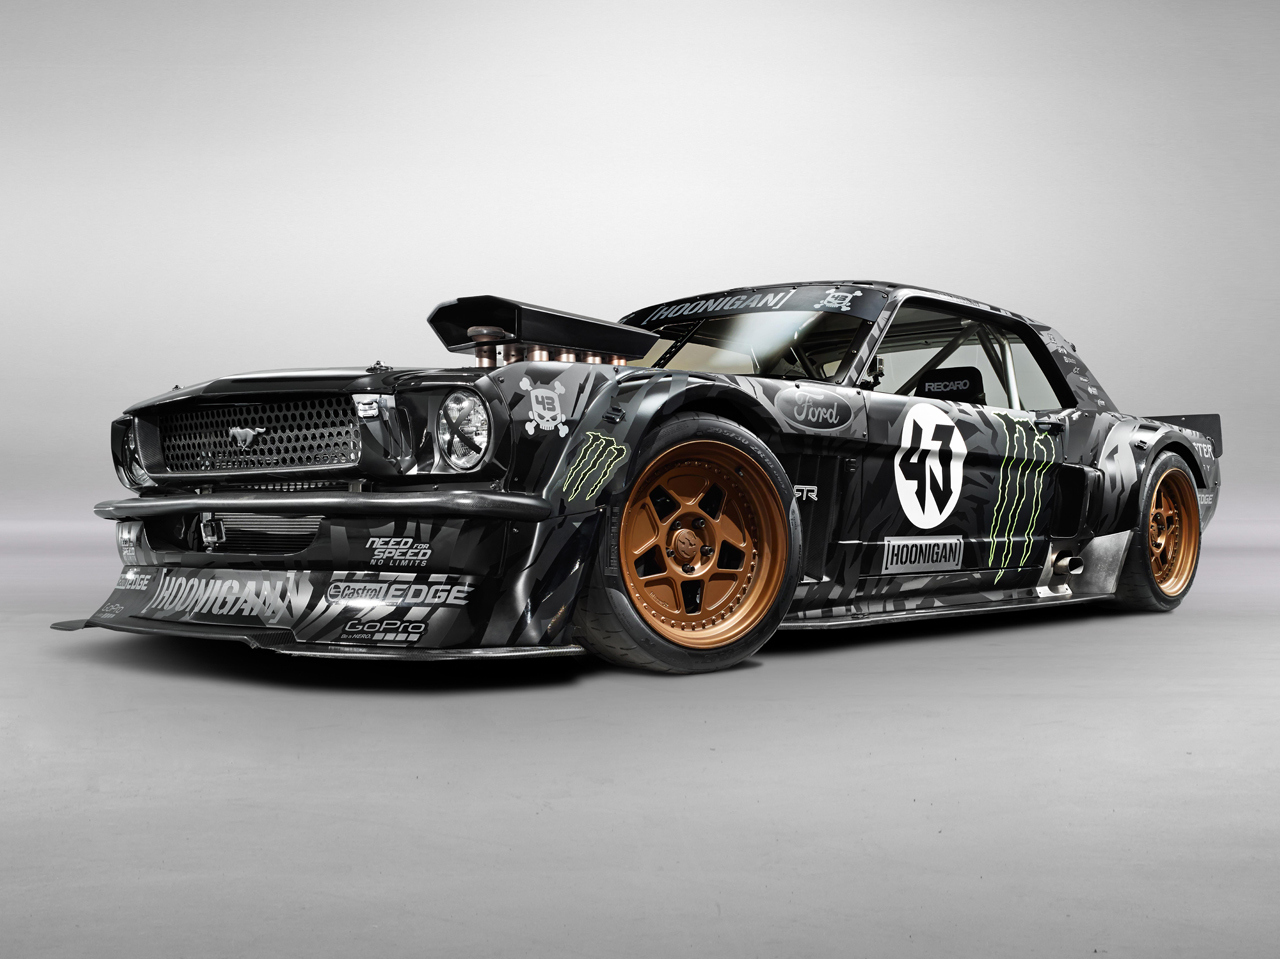 Ford Mustang Hoonicorn RTR